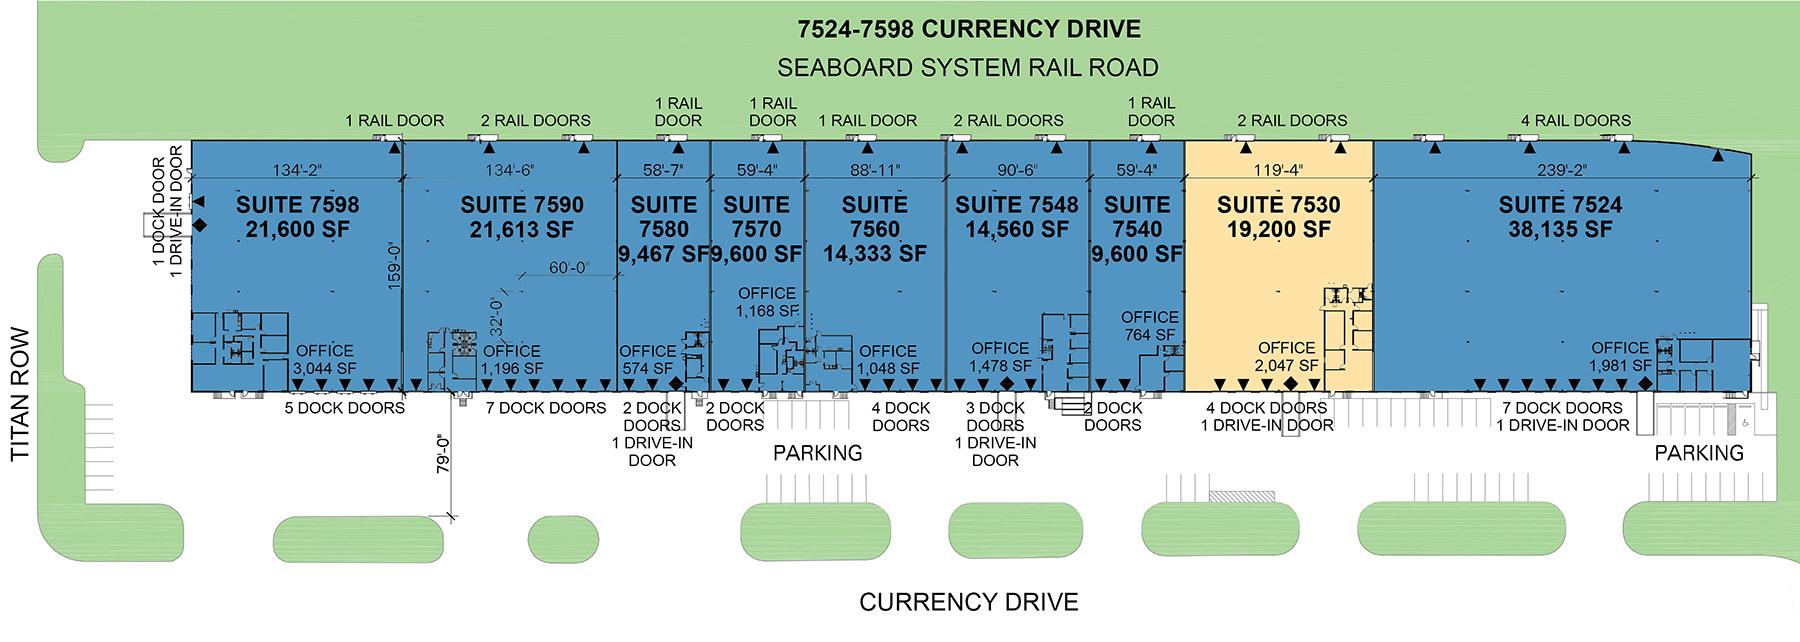 DPM-Prologis-Orlando-Central-Park_7524-7598-Currency-Dr_Flyer-Plan.jpg